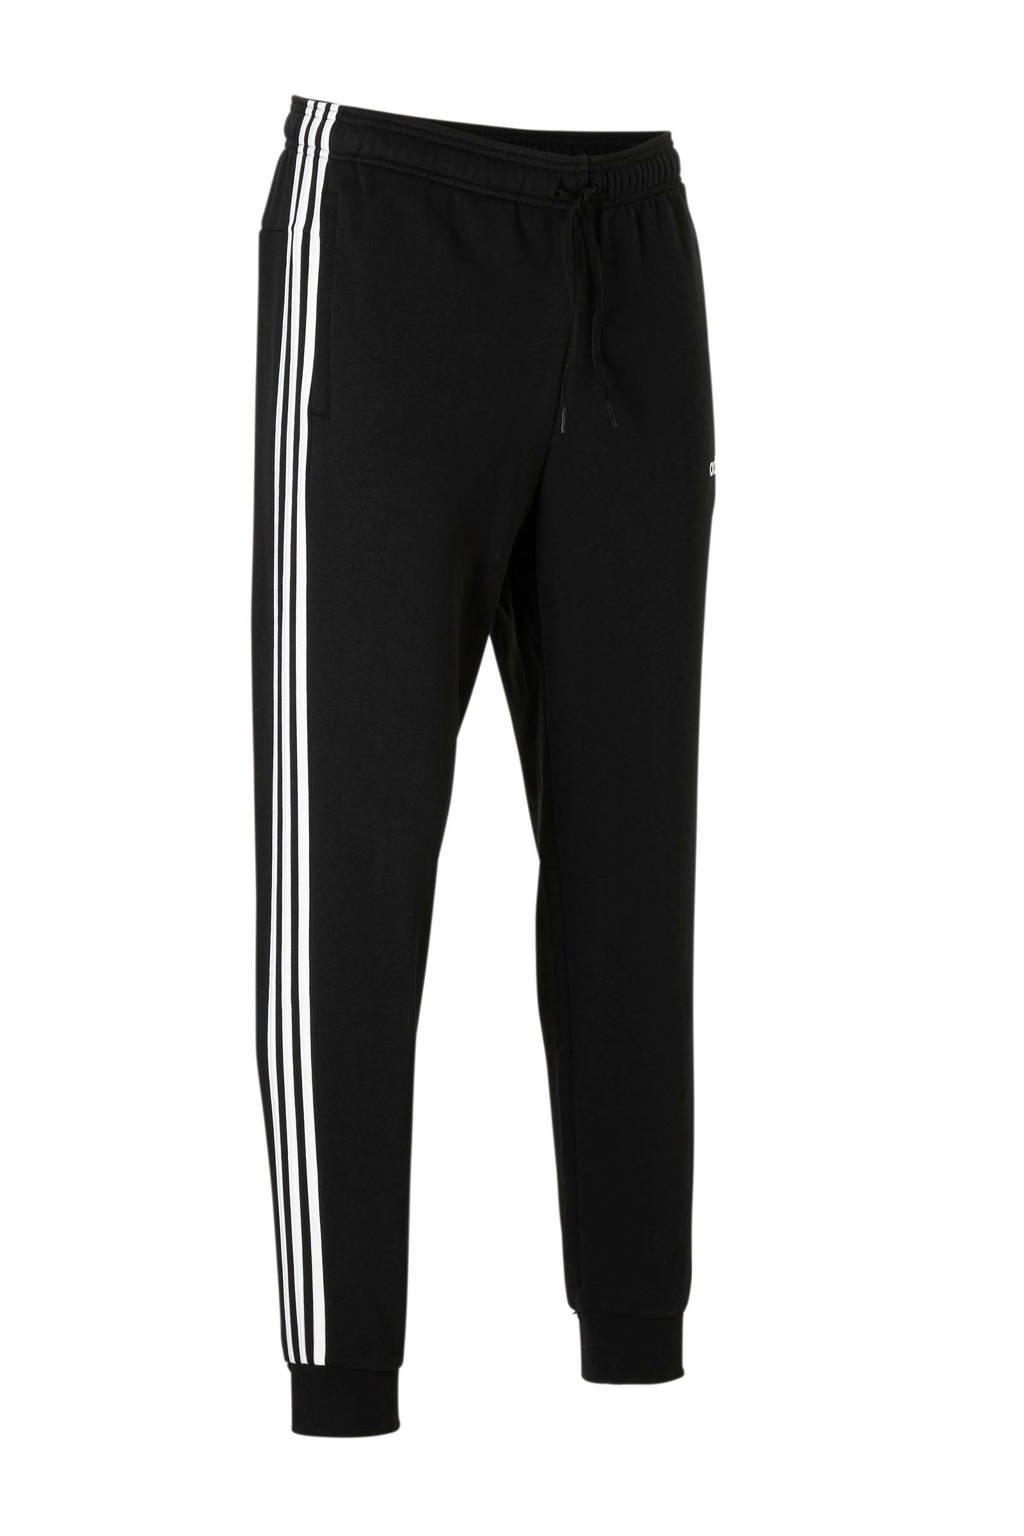 adidas performance   joggingbroek zwart, Zwart/wit